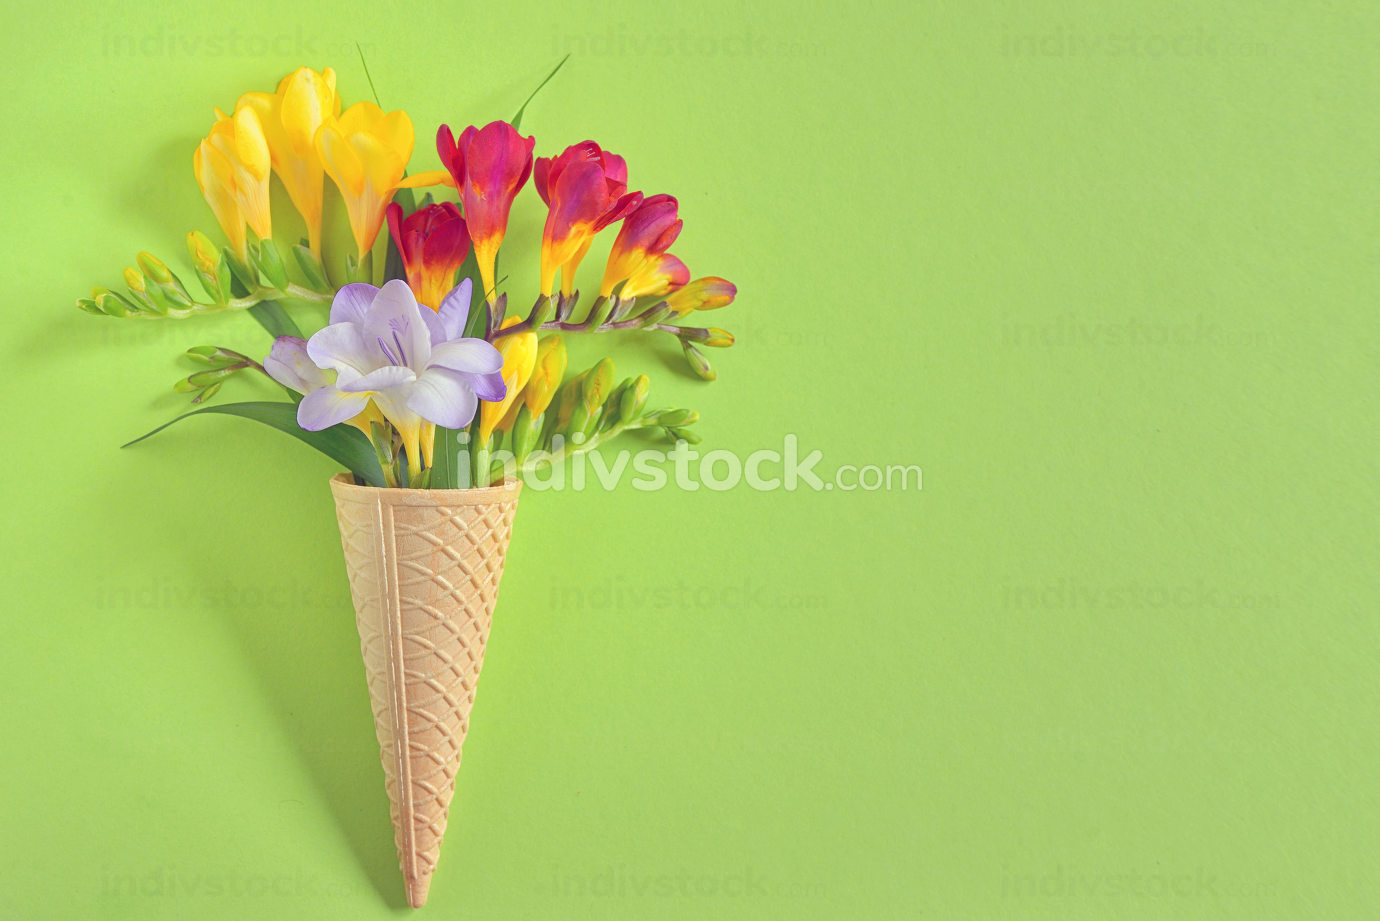 Freesias flowers in ice cream waffles